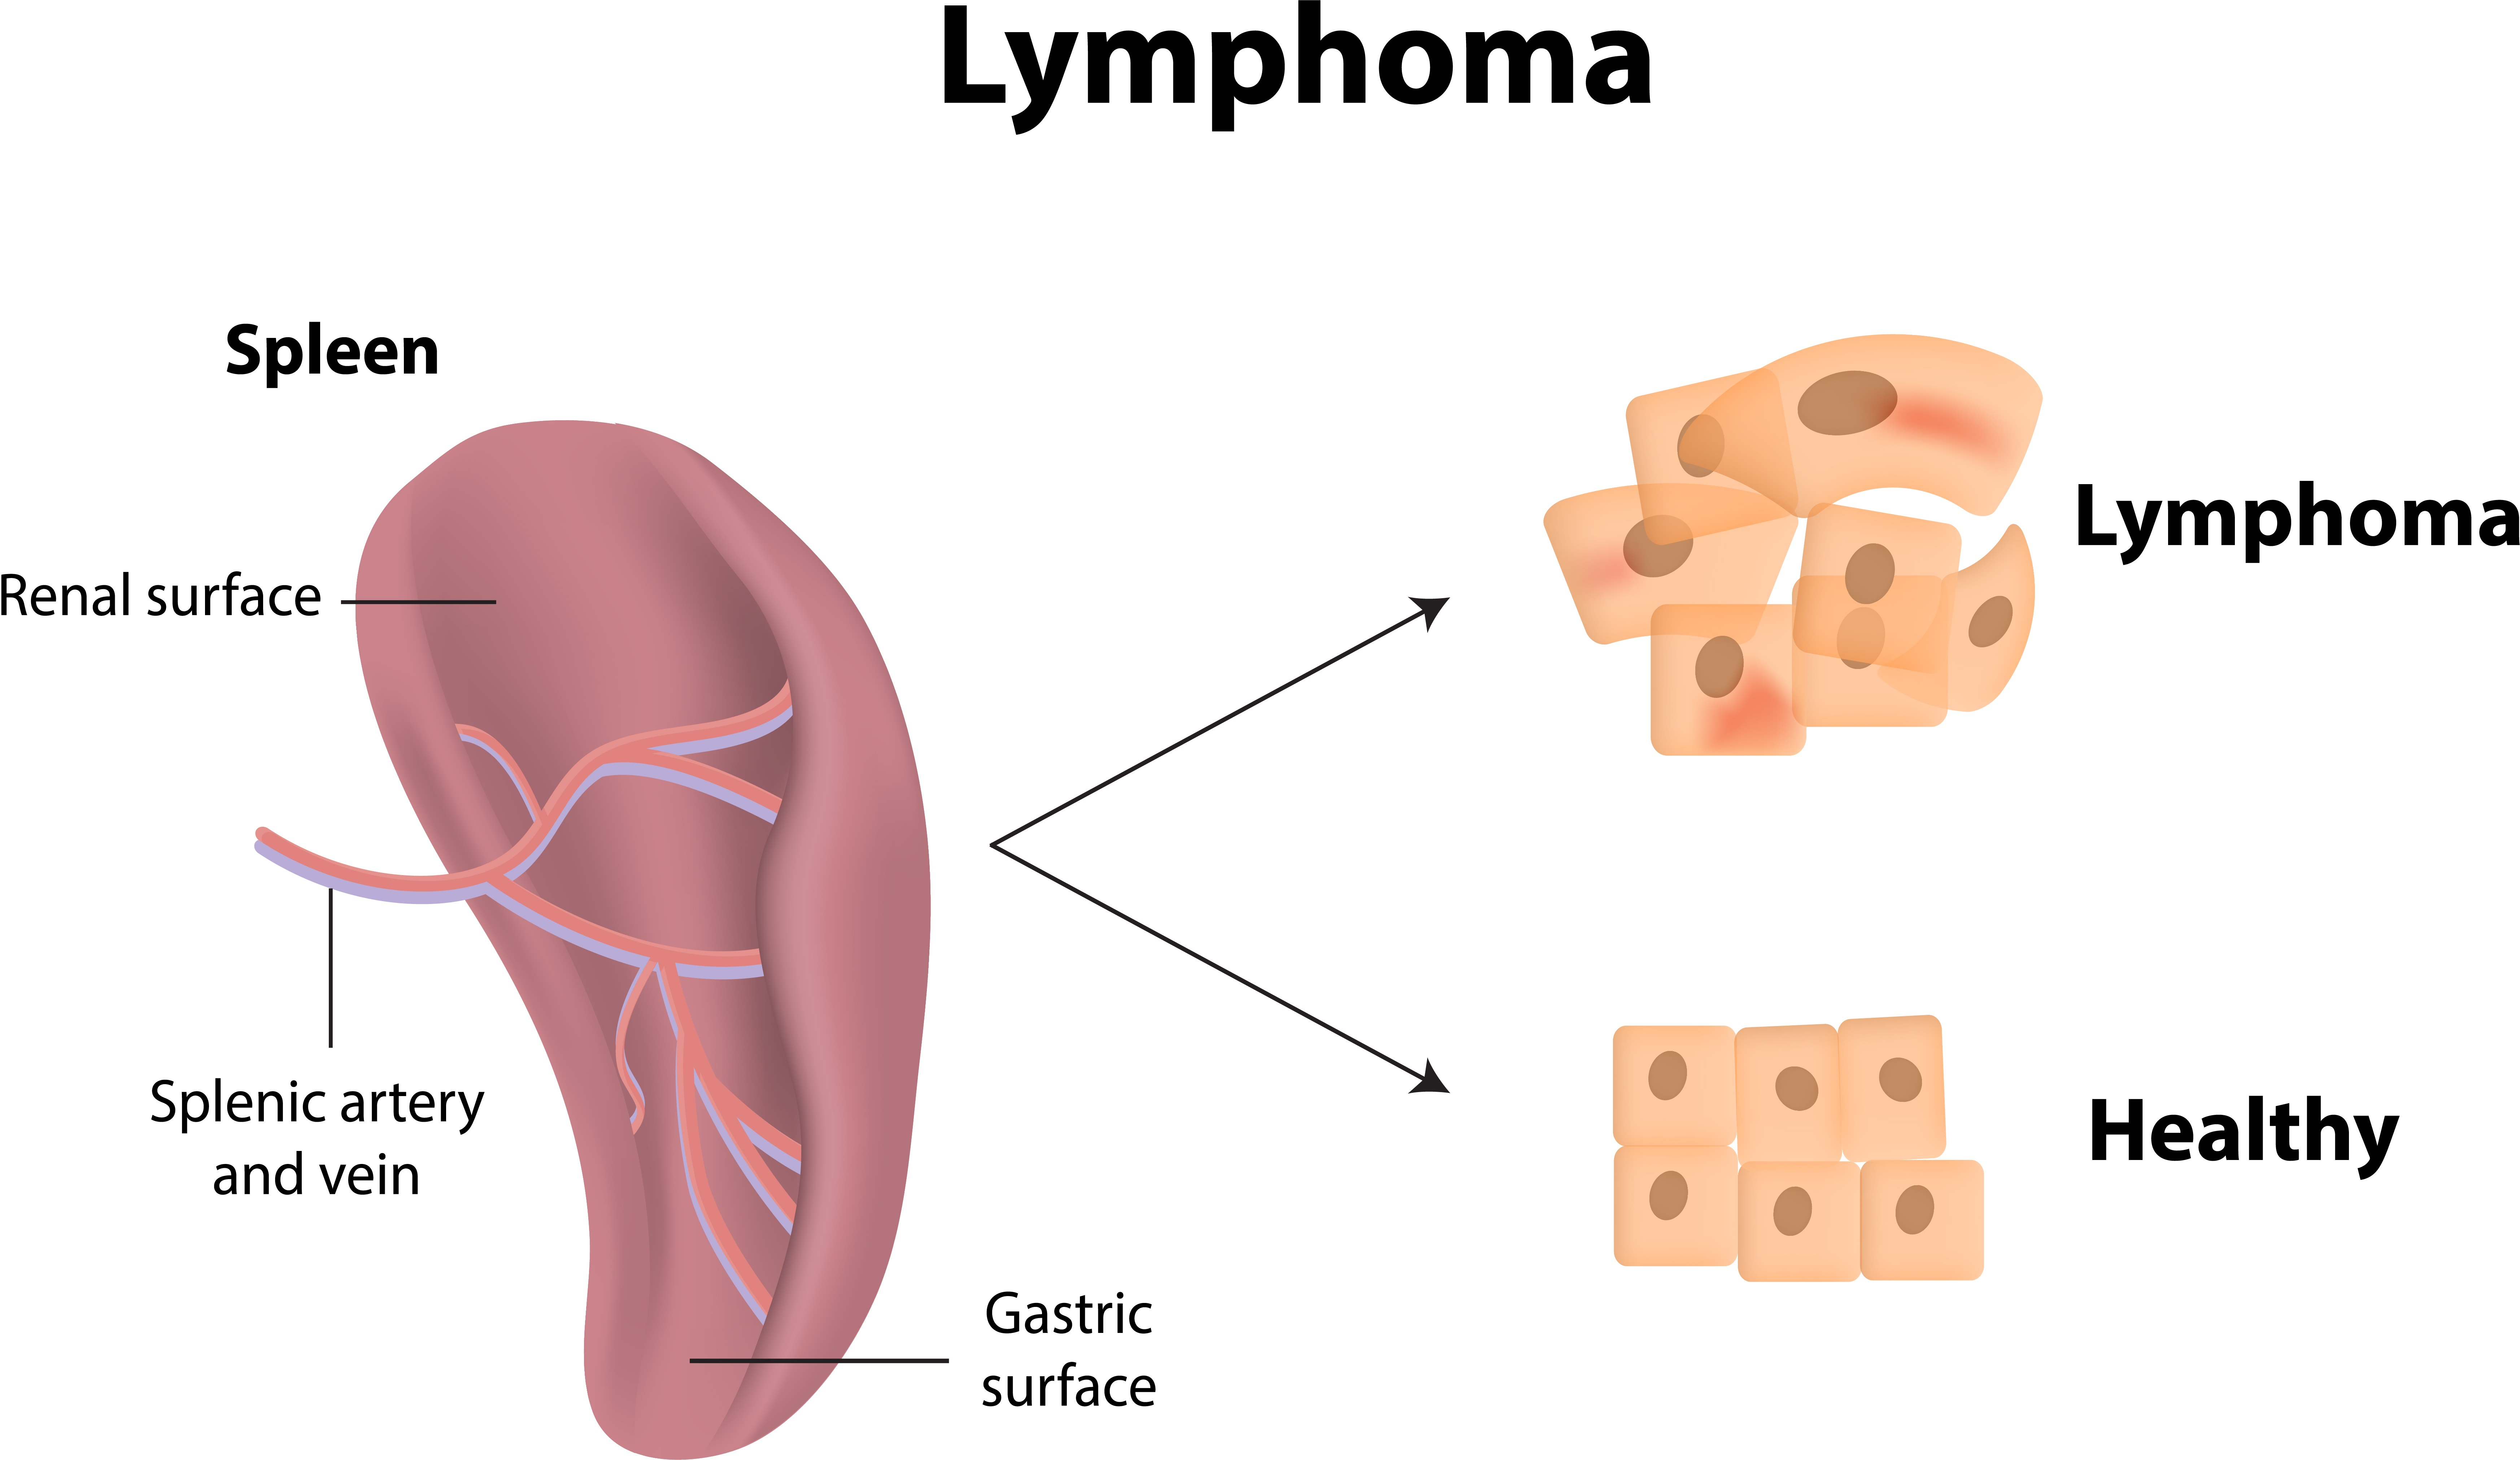 lymphoma.jpg